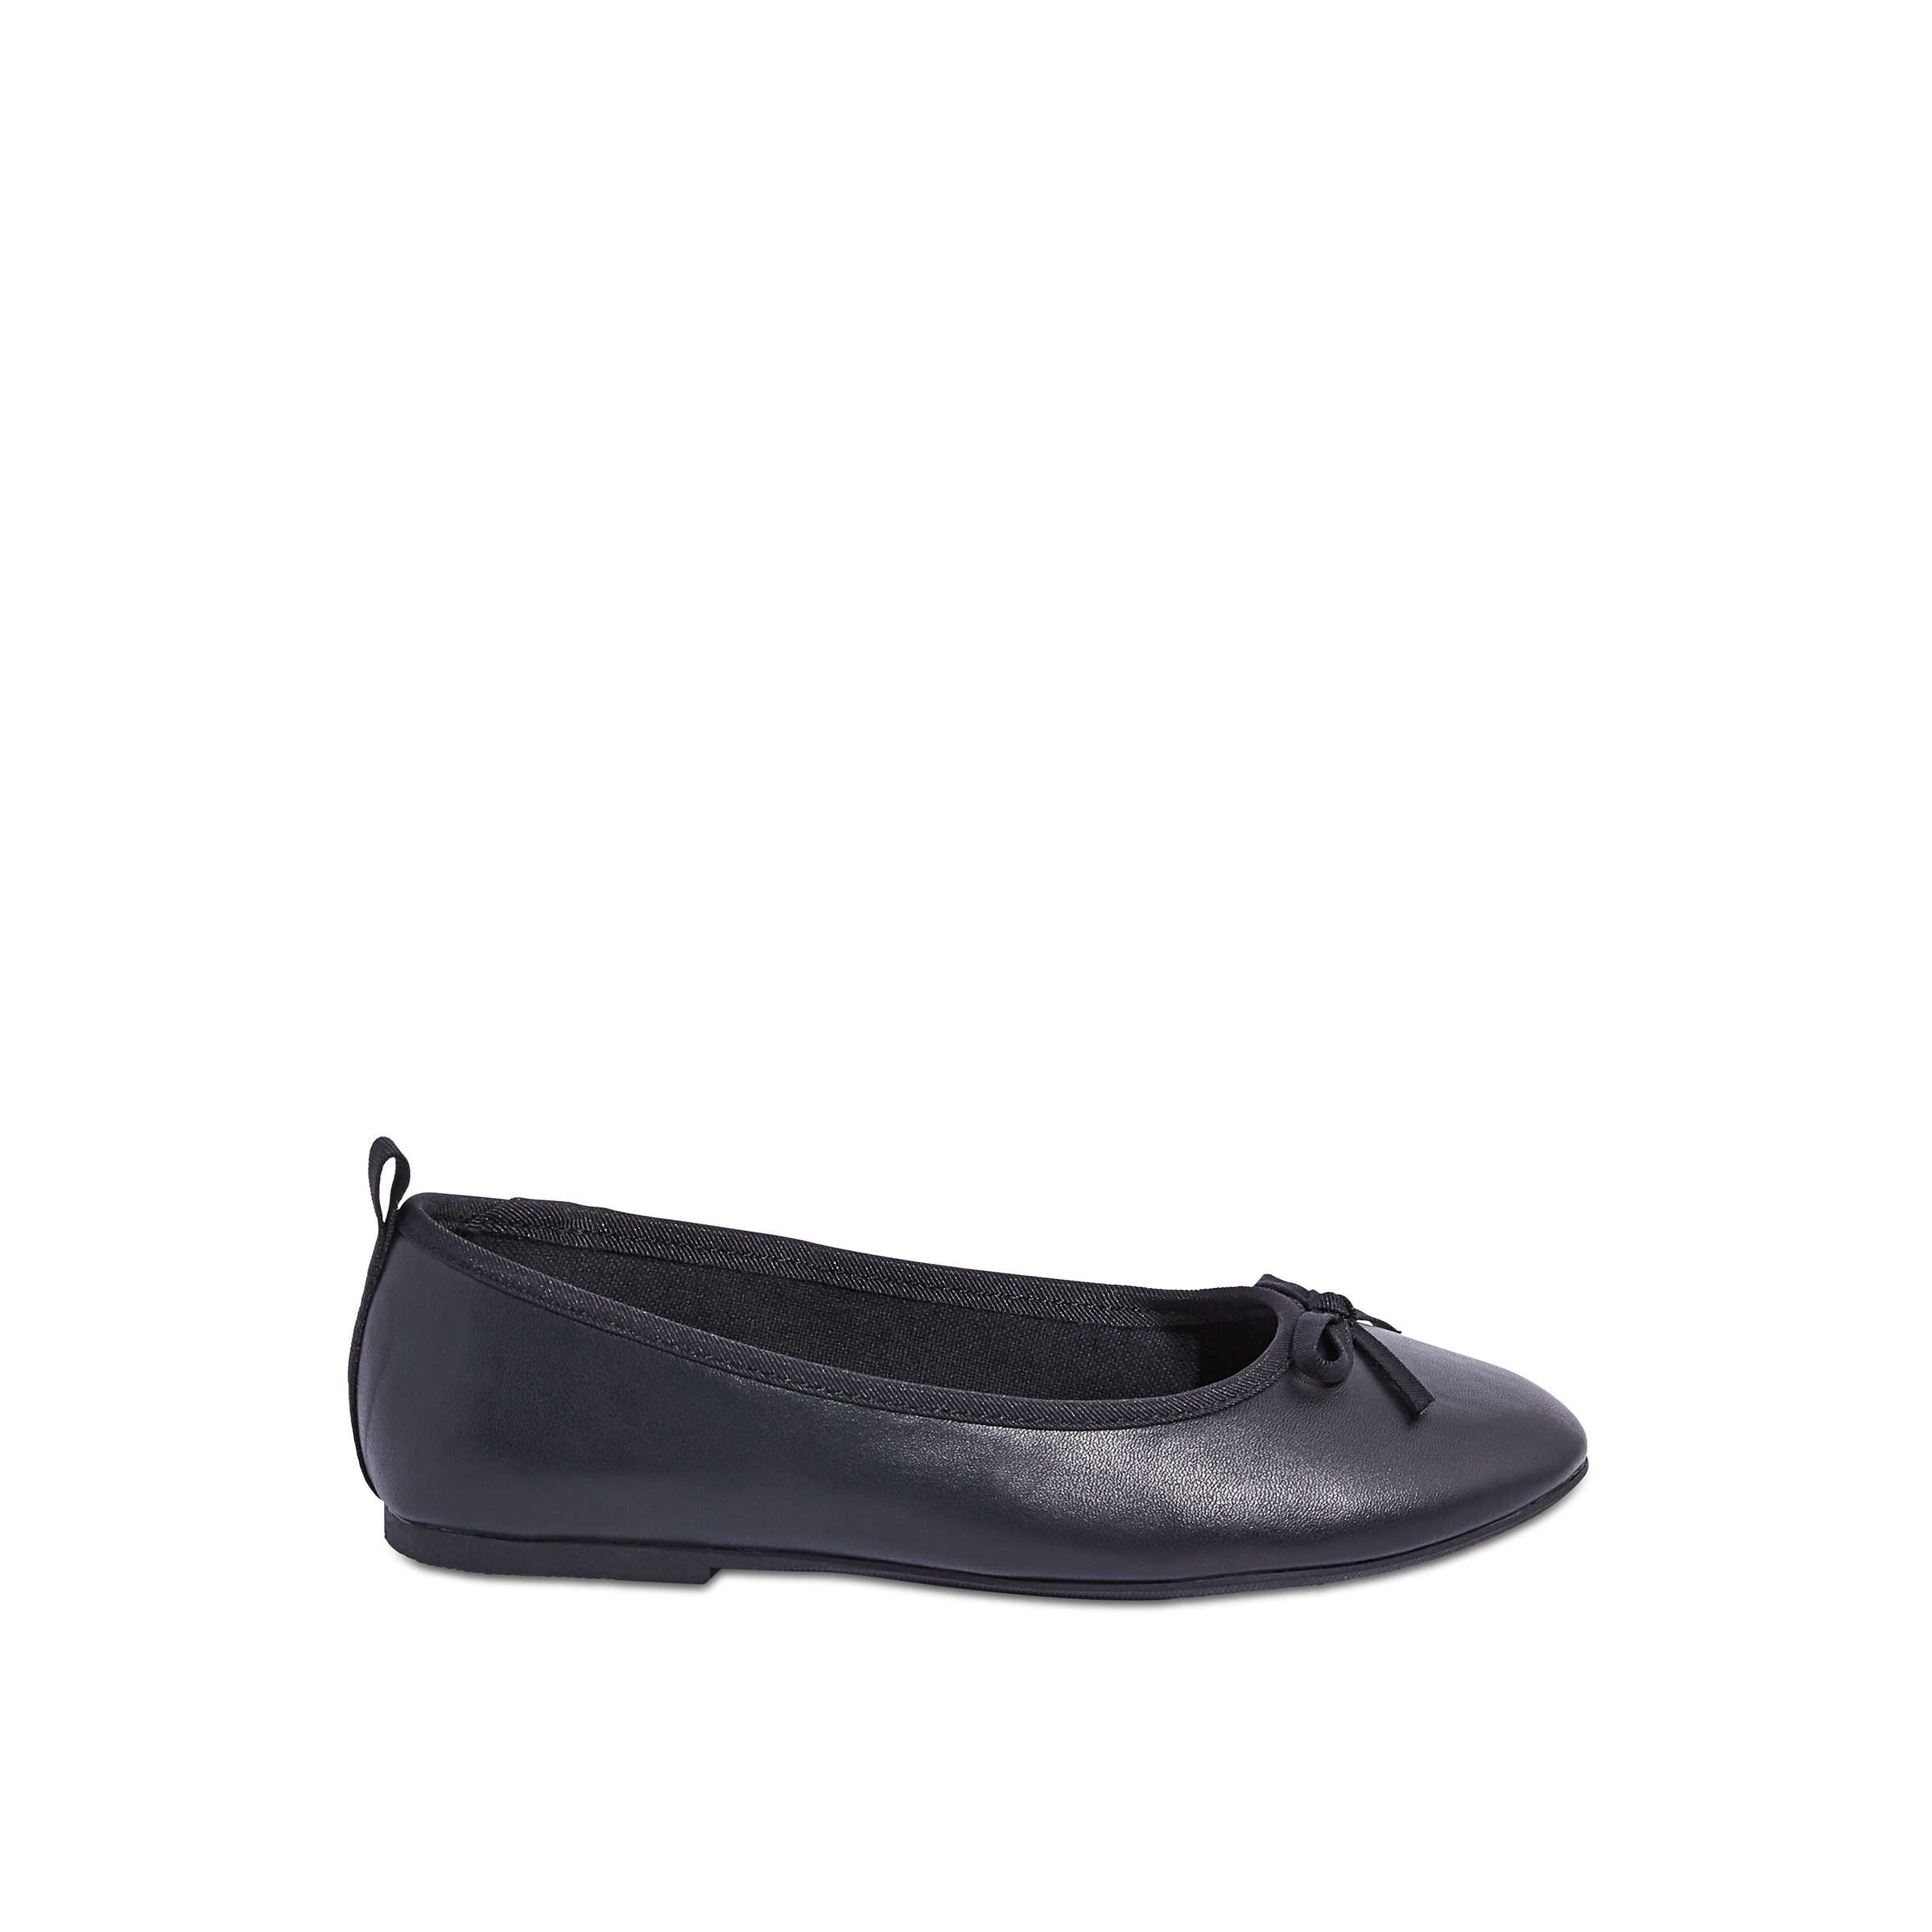 Kid Girls' Ballet Flats in Black from